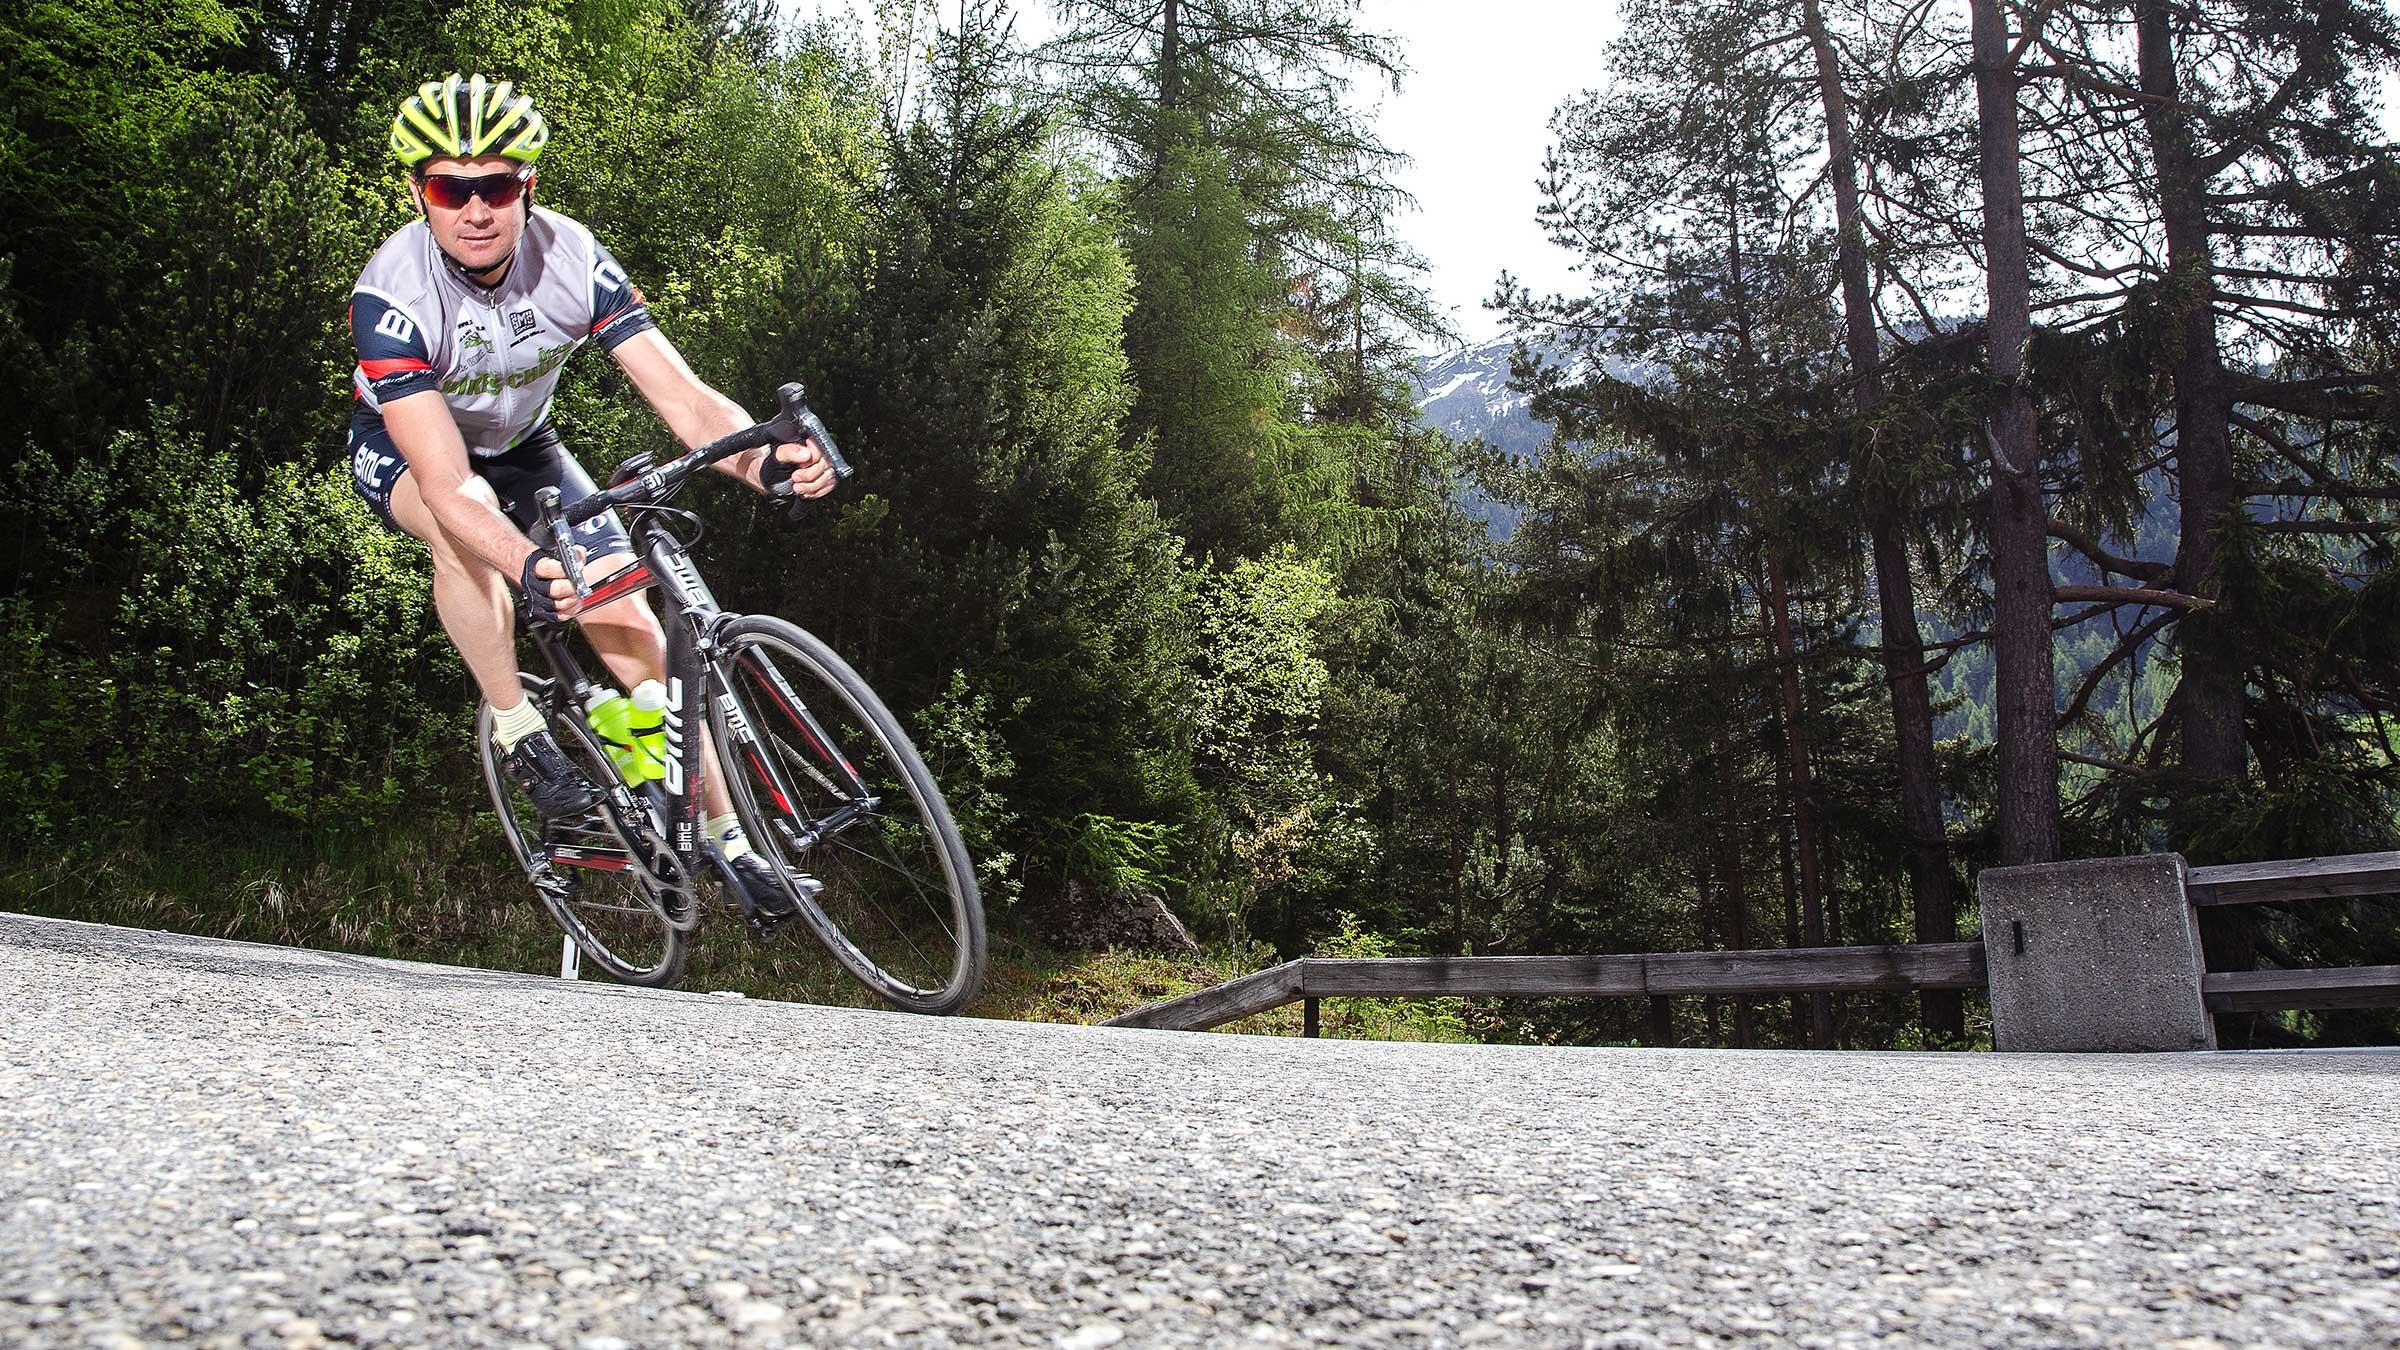 Urban Gstrein Abfahrt - Ötztaler Radmarathon Pro Ötztaler 5.500